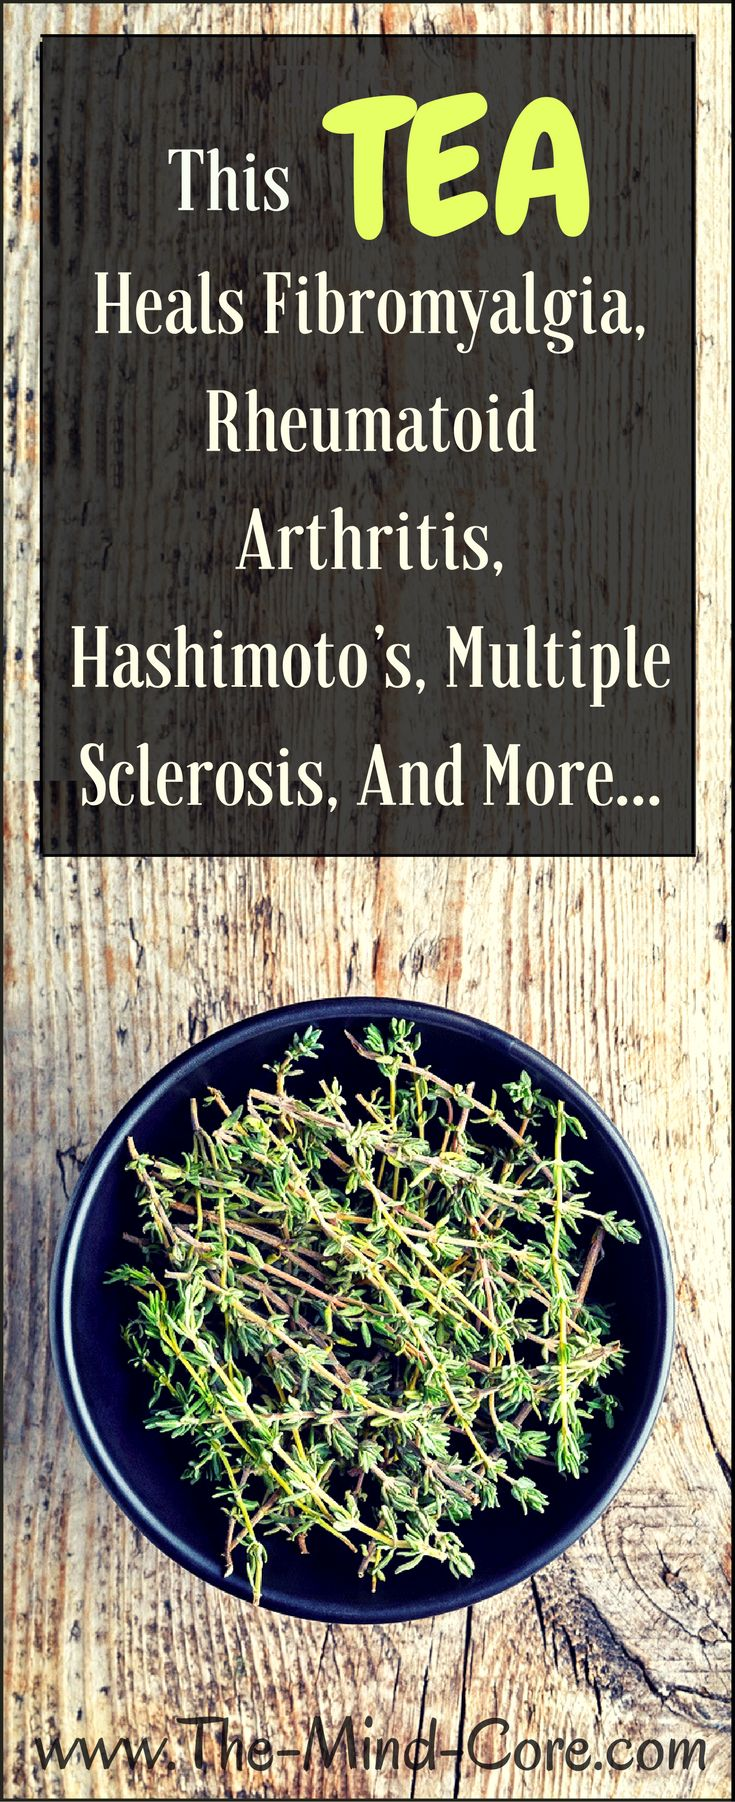 This Tea Heals Fibromyalgia, Rheumatoid Arthritis, Hashimoto's, Multiple Sclerosis, And More…